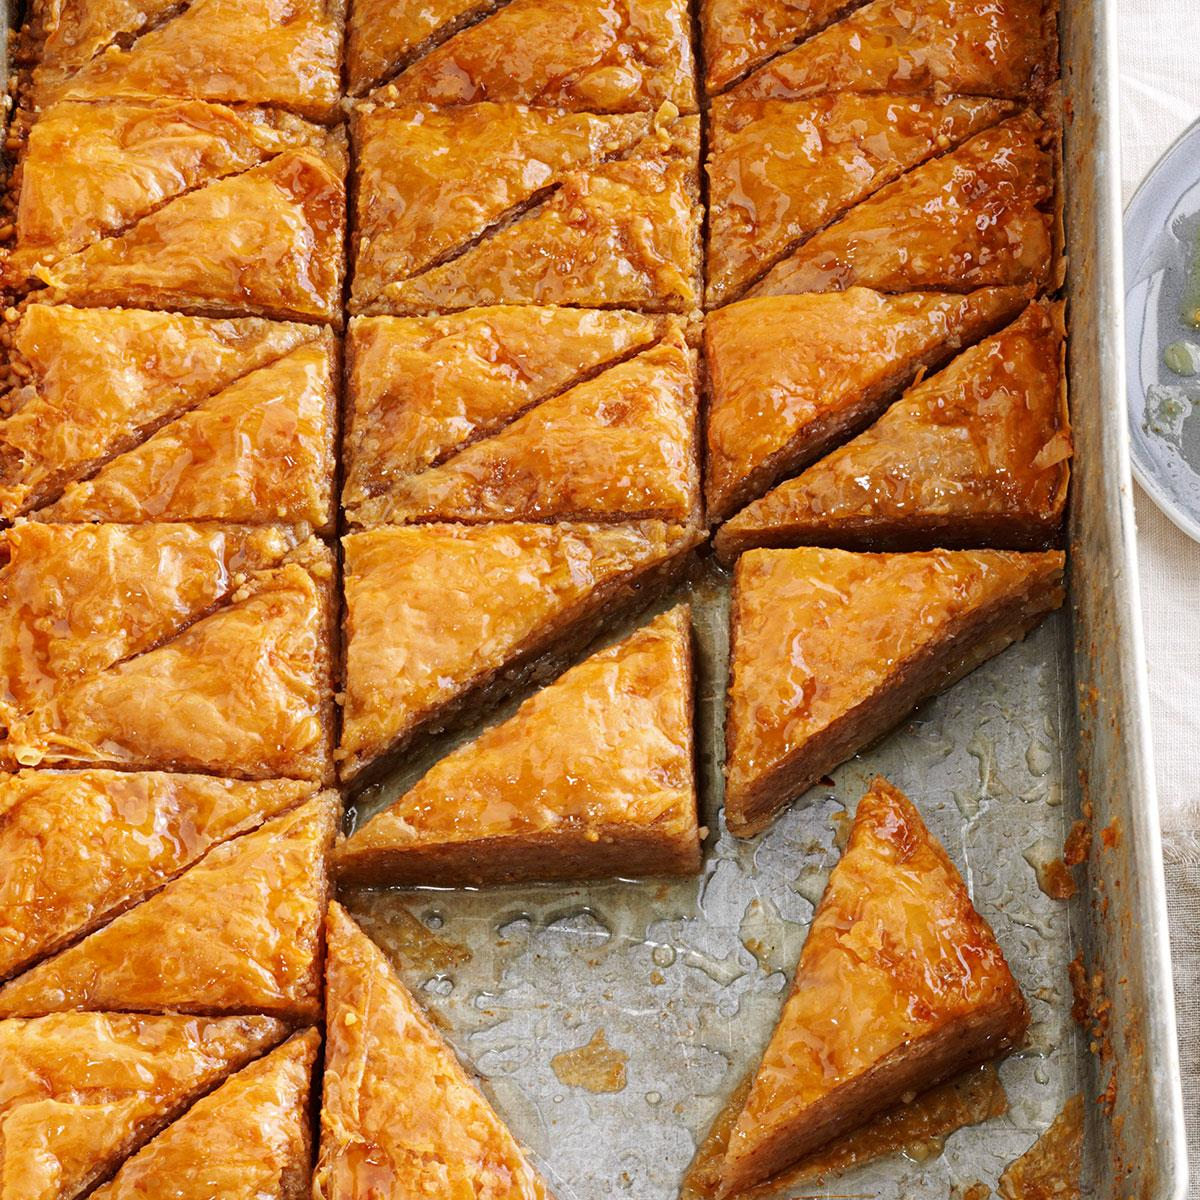 Chipotle Orange Baklava Recipe How To Make It Taste Of Home